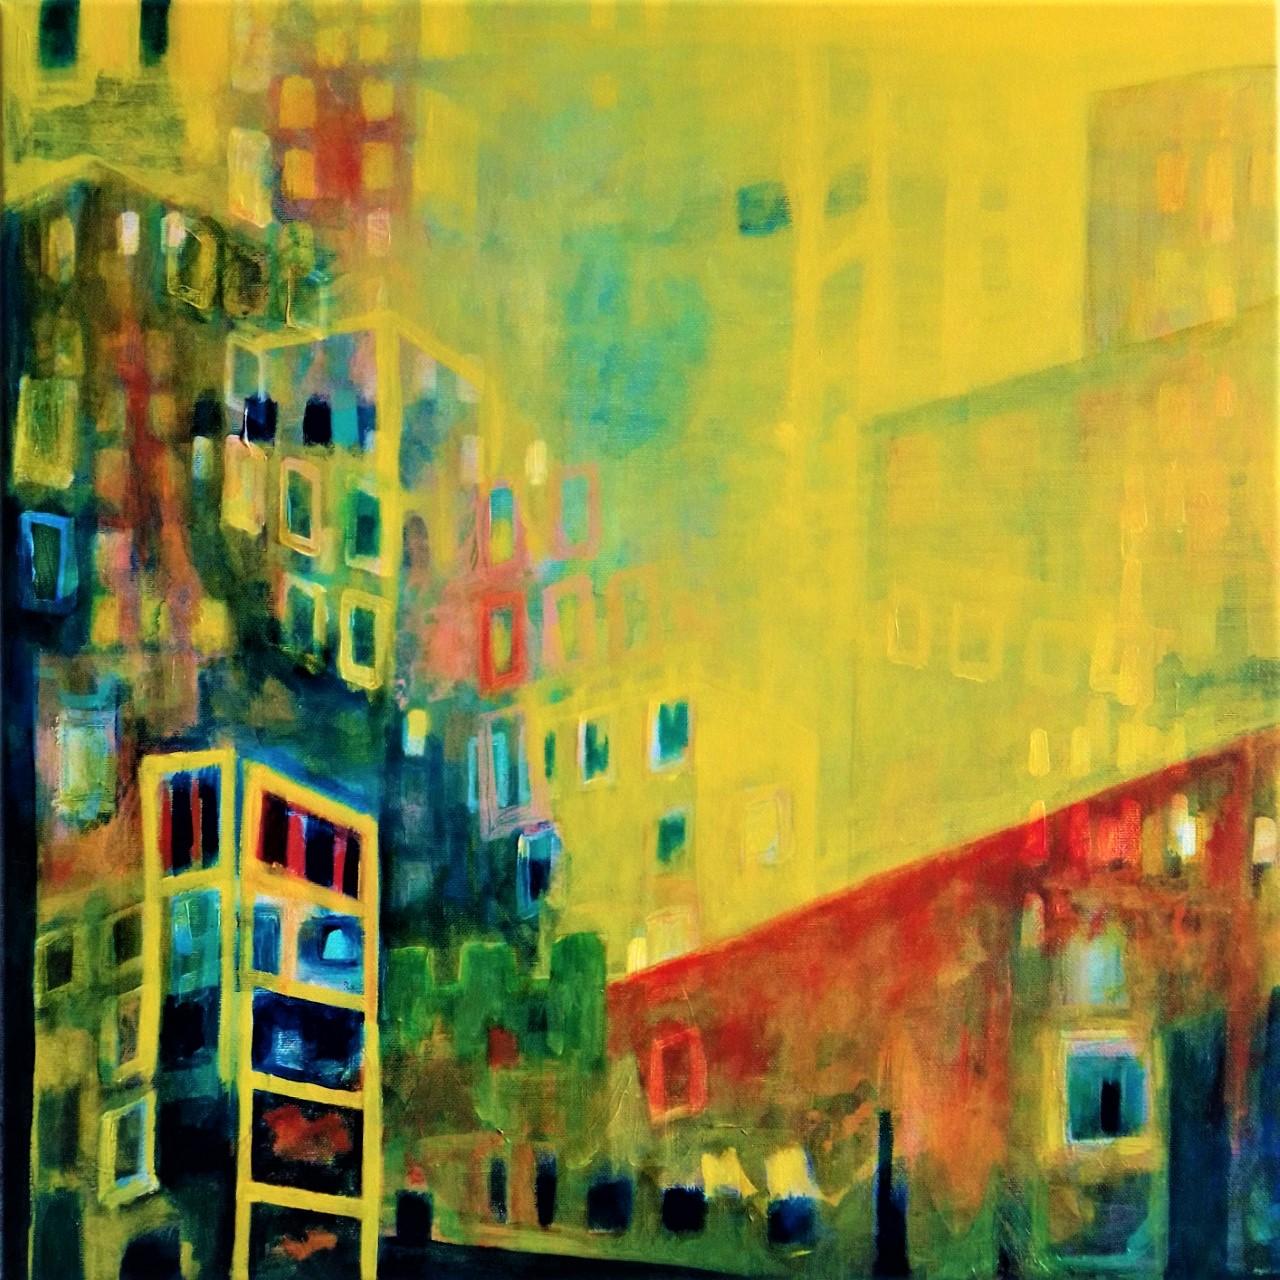 schilderij-contemporary-art-artist-kunstenaar-l-tuziasm-utrecht-off-the-wall-urban-landscape